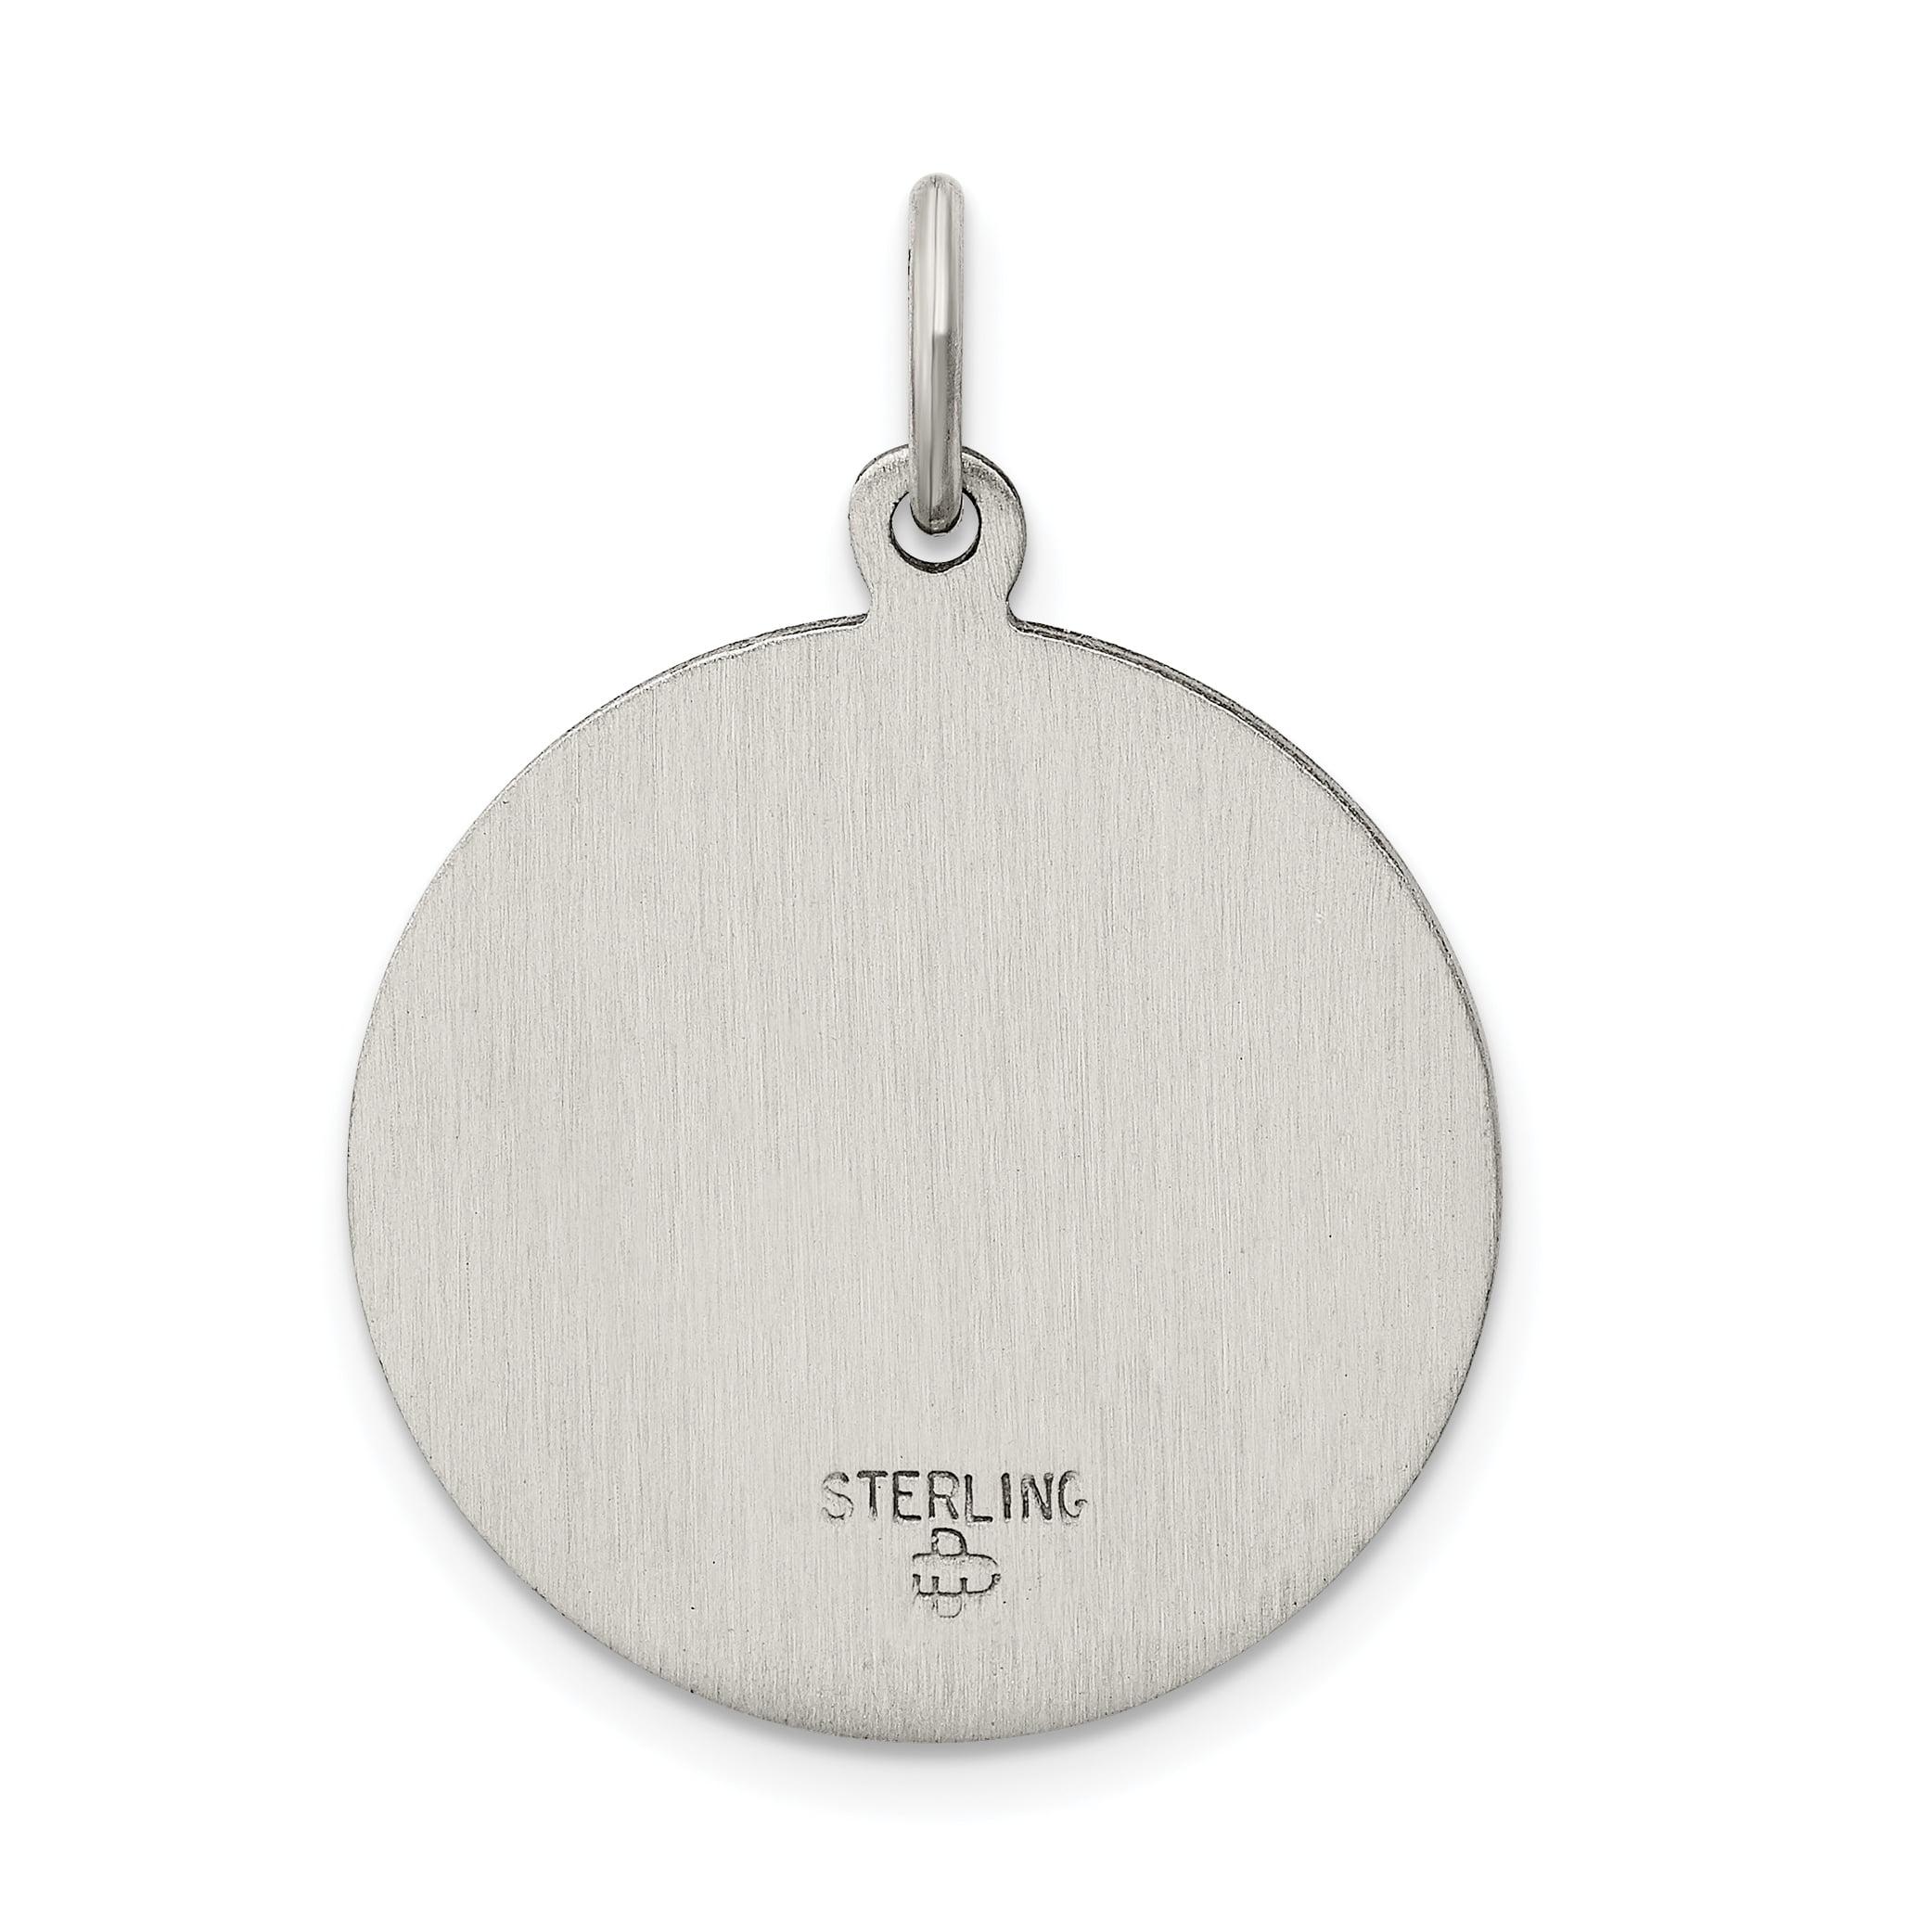 AJK Gifts All Weather Duffle 1-Piece//Blank//No Logo #SDPQI-SSWNW